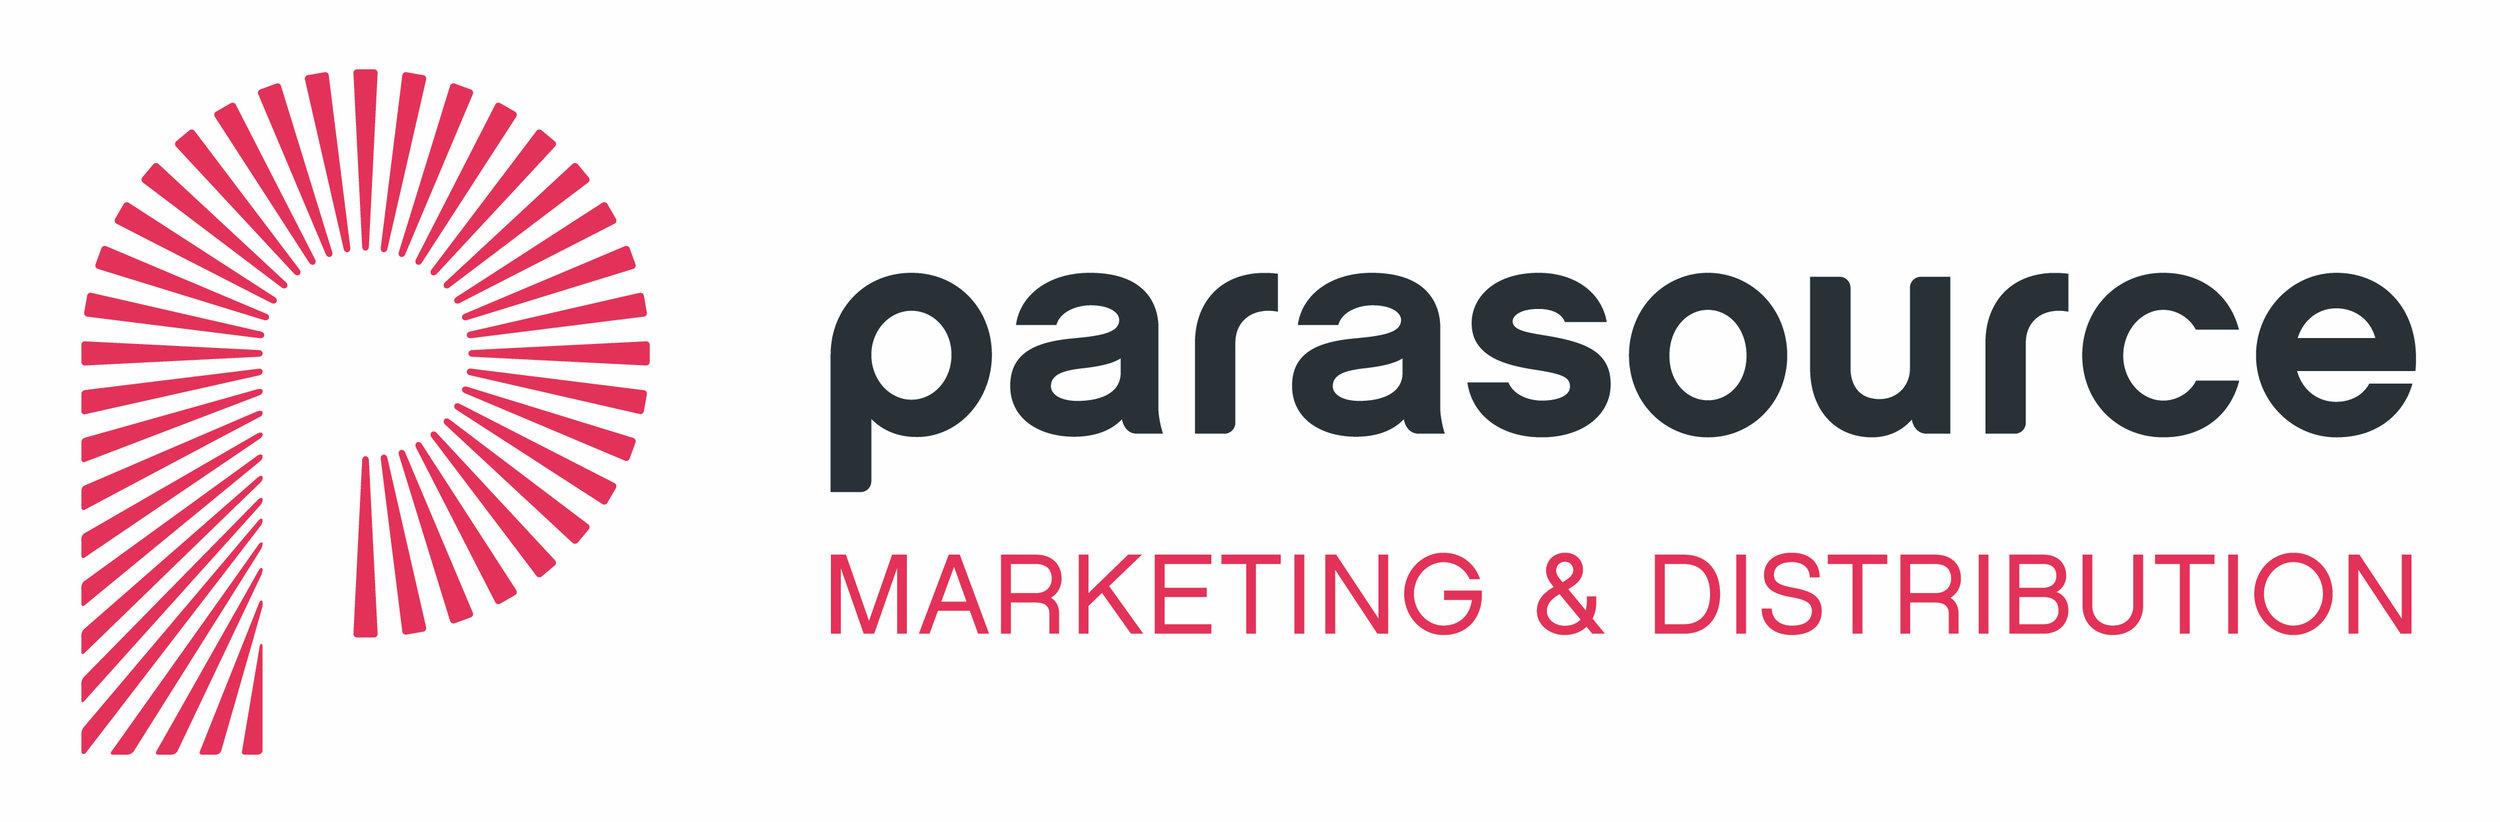 www.parasource.com